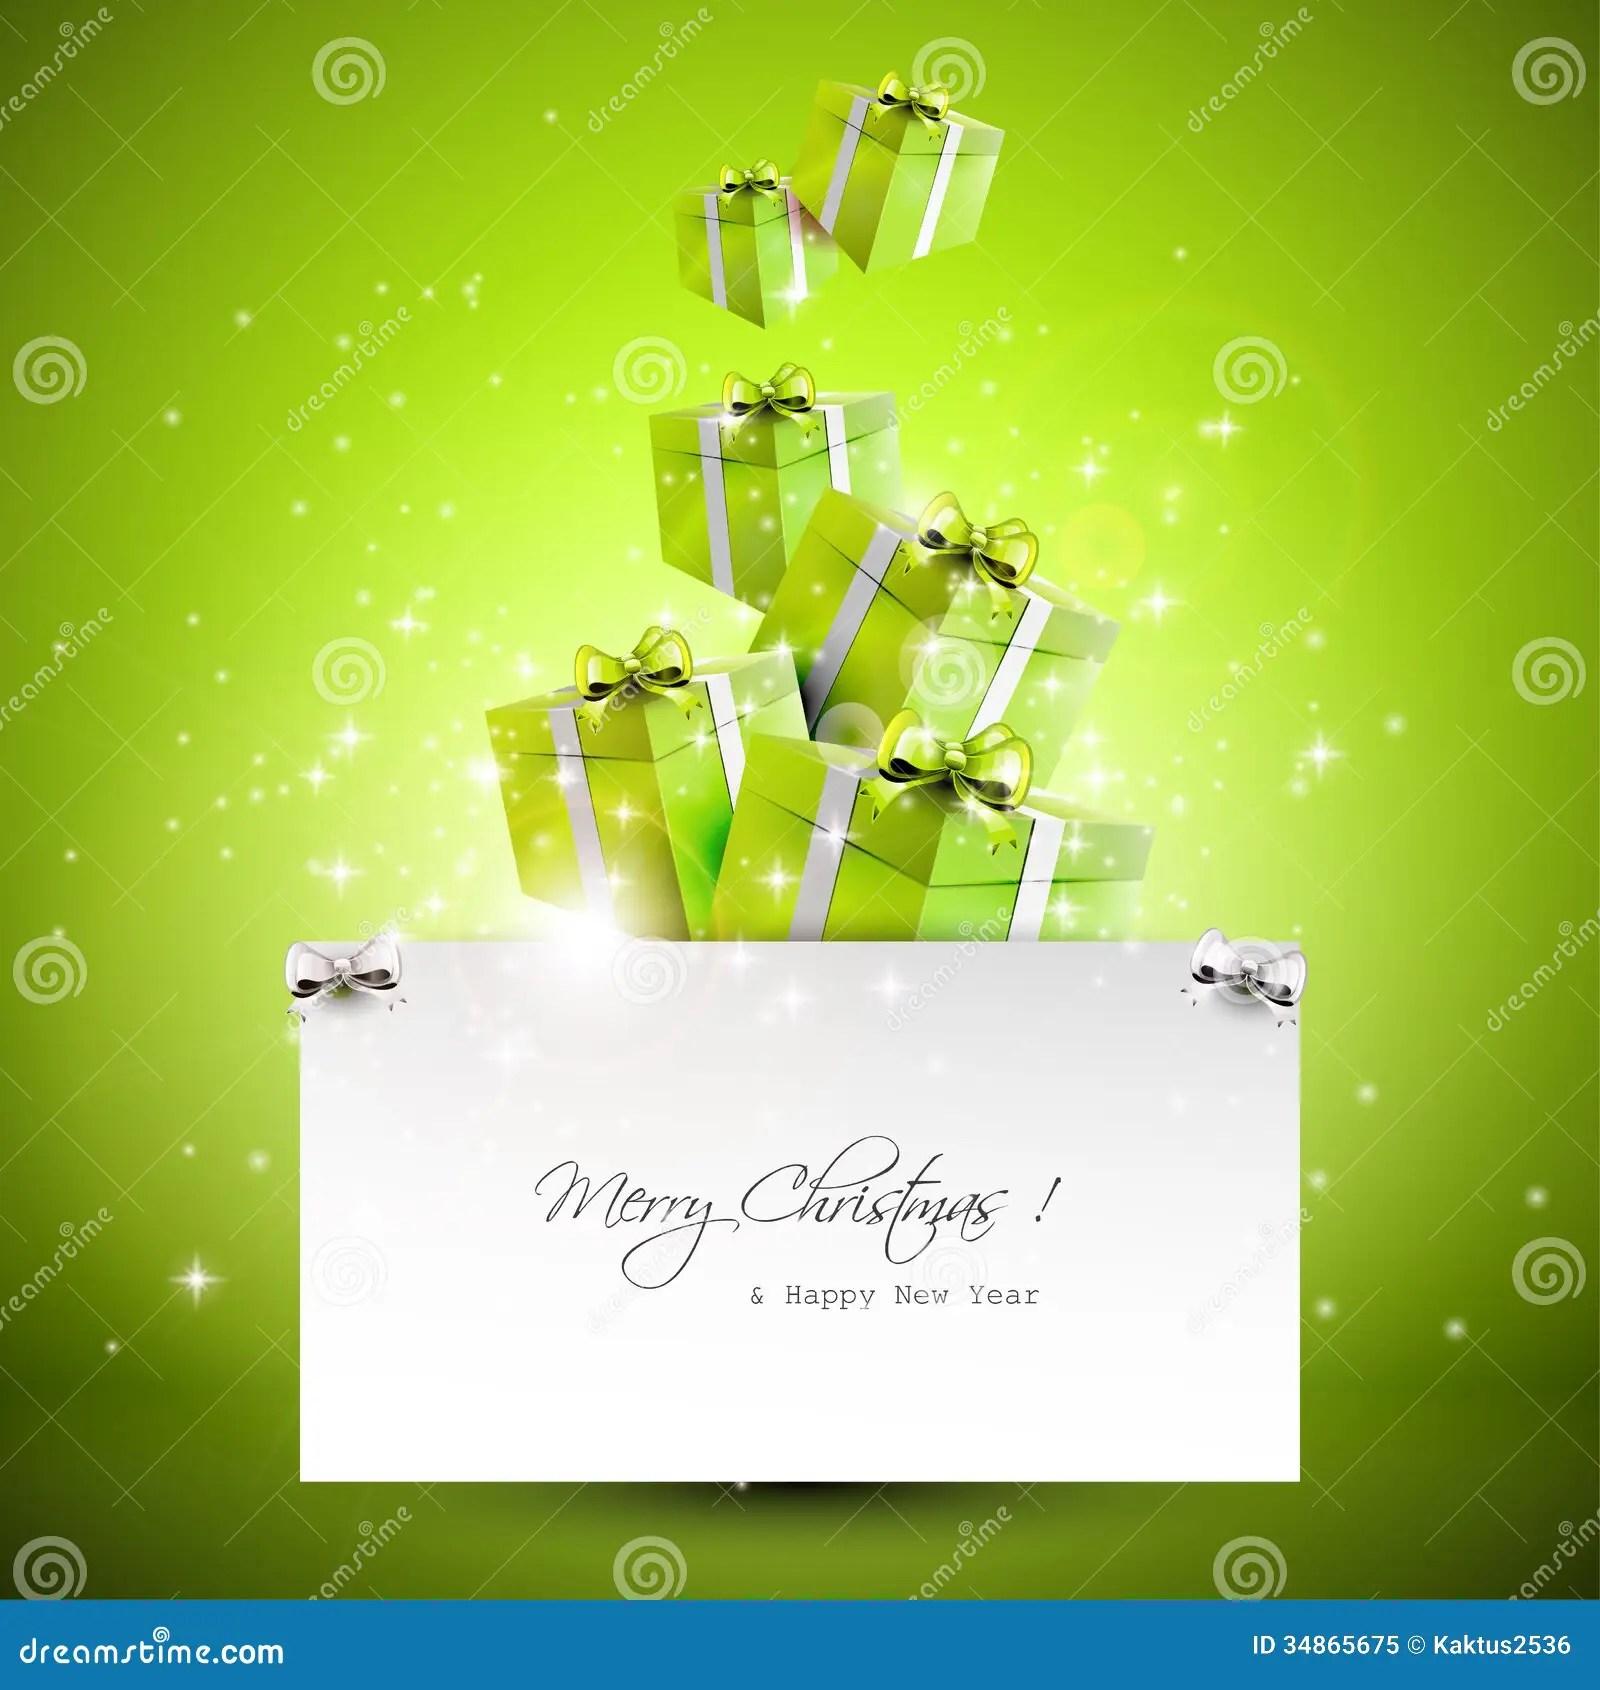 Modern Christmas Greeting Card Stock Vector Illustration